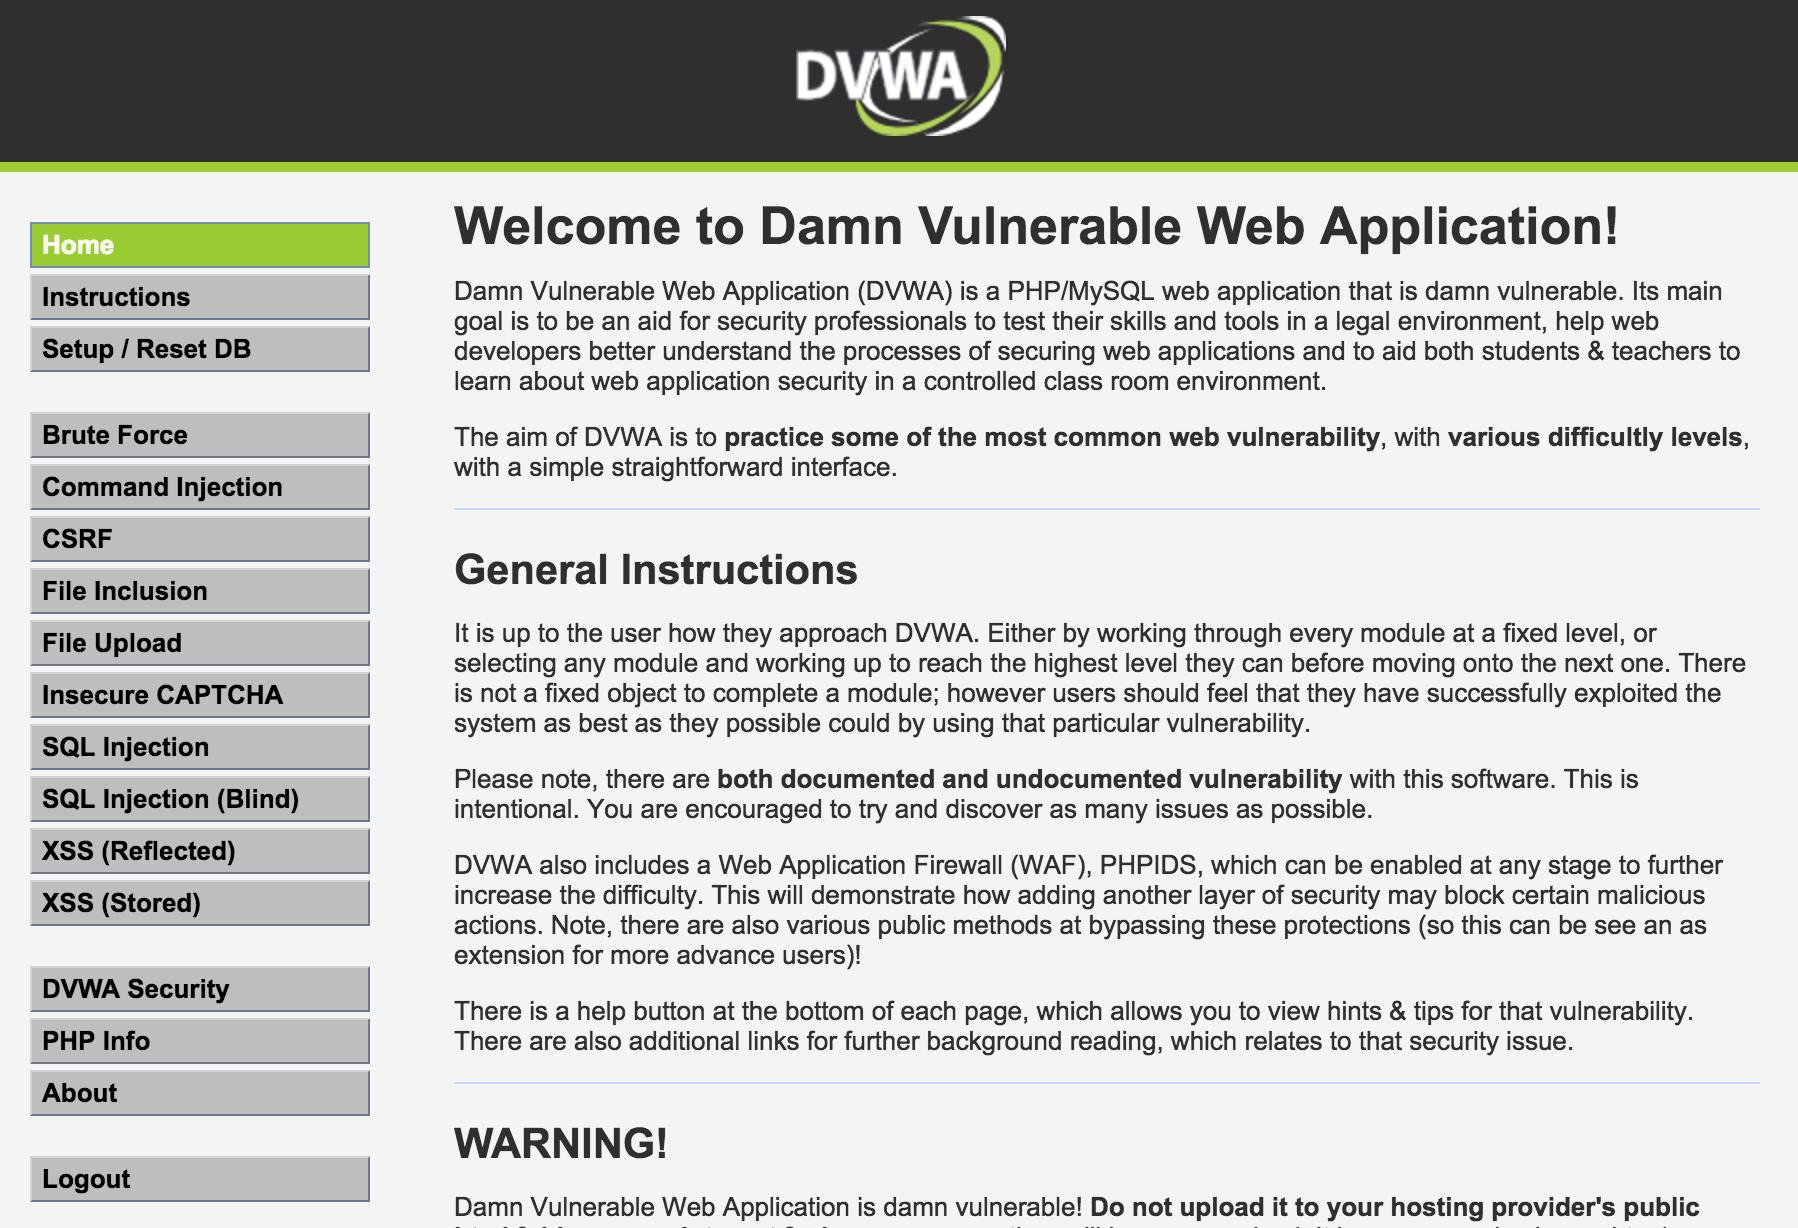 Damn Vulnerable Web Application DVWA